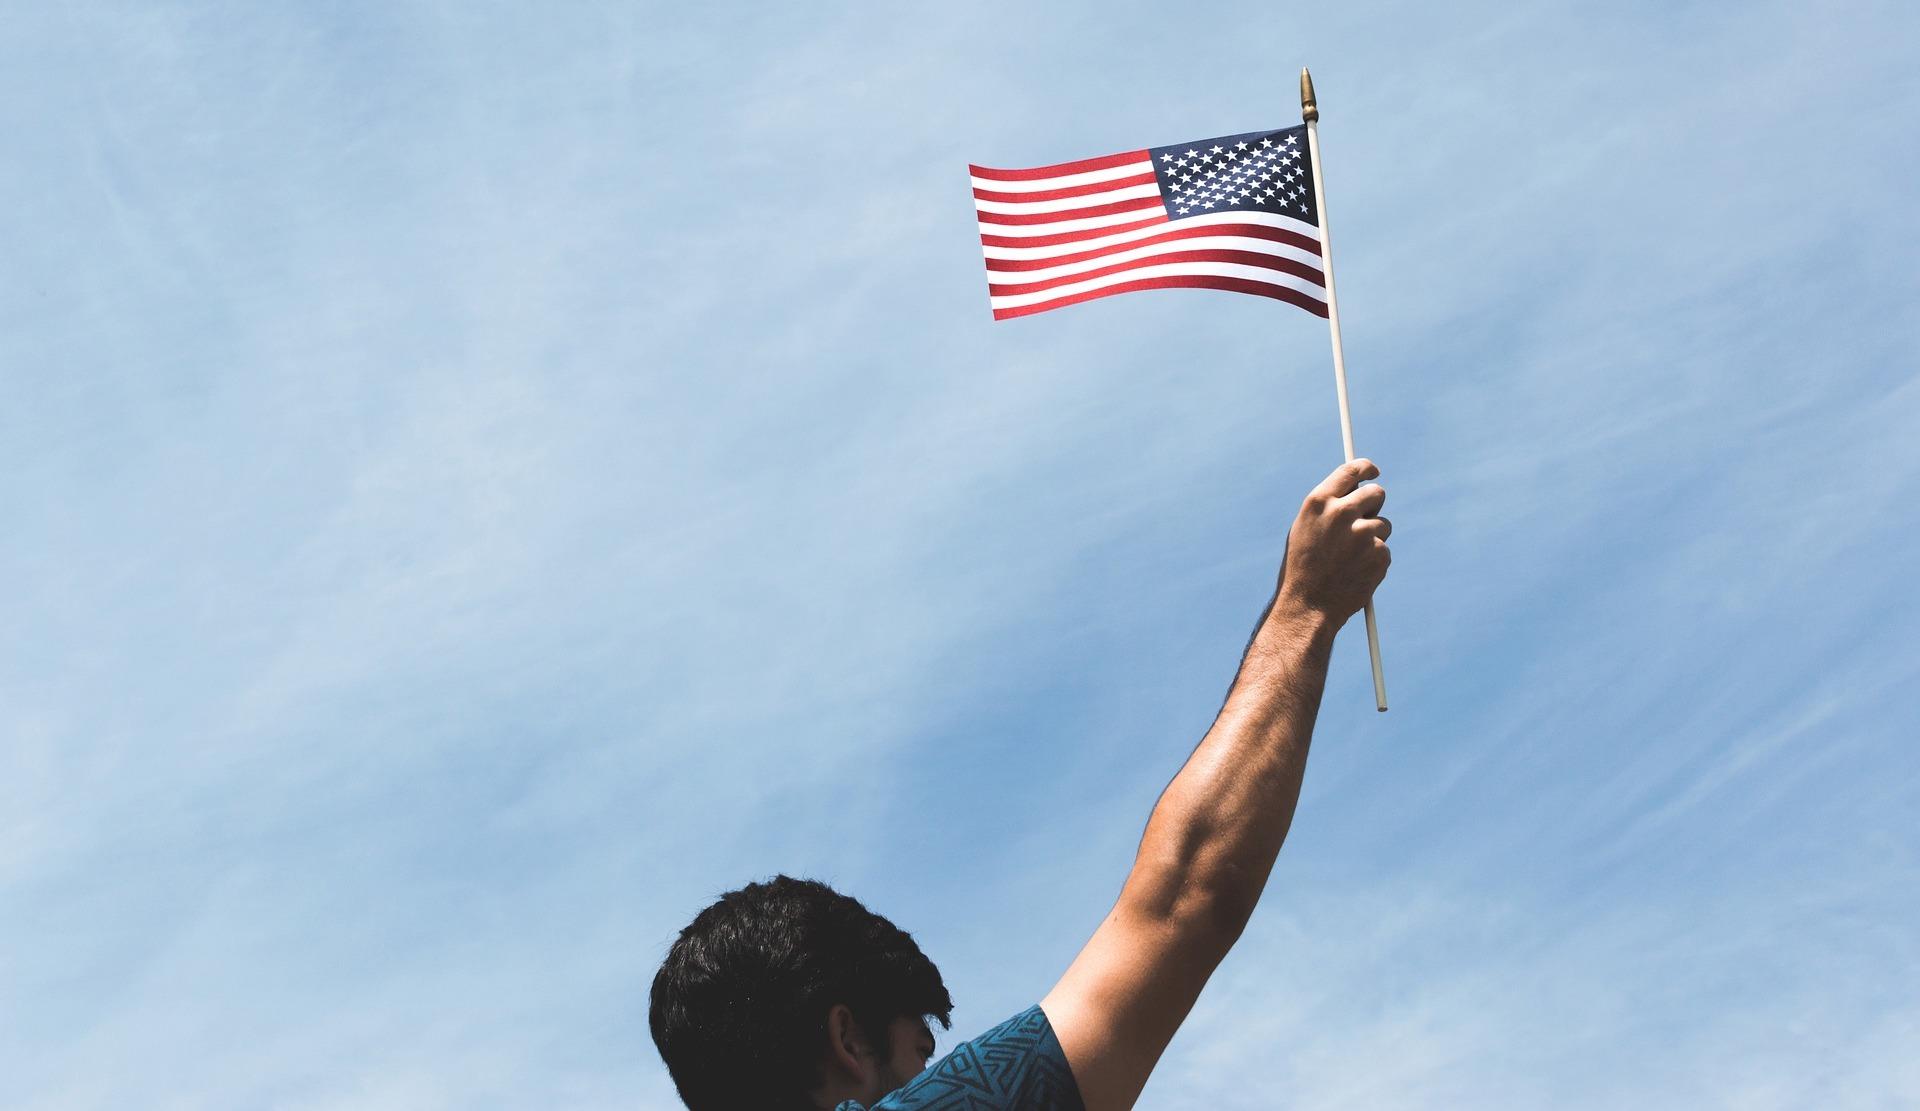 man holding an American flag